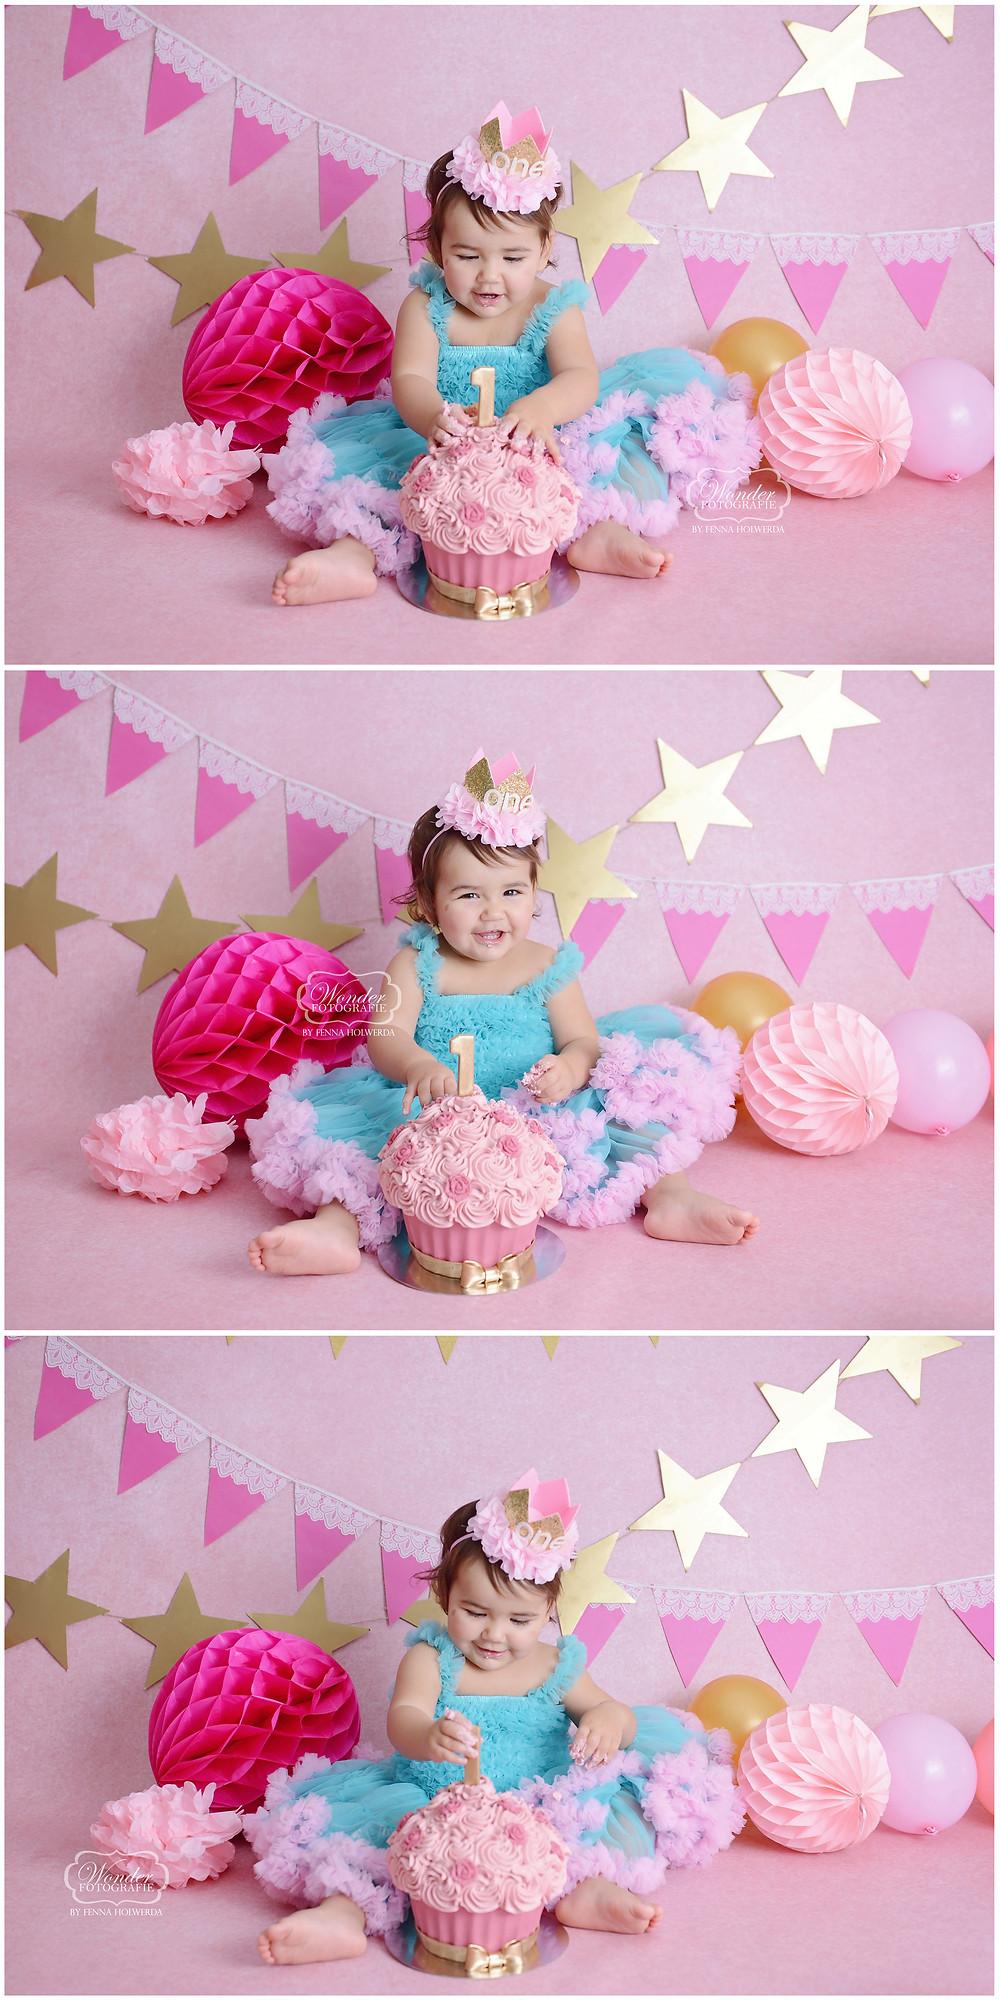 cake smash fotoshoot fotografie roze goud inspiratie tips tricks